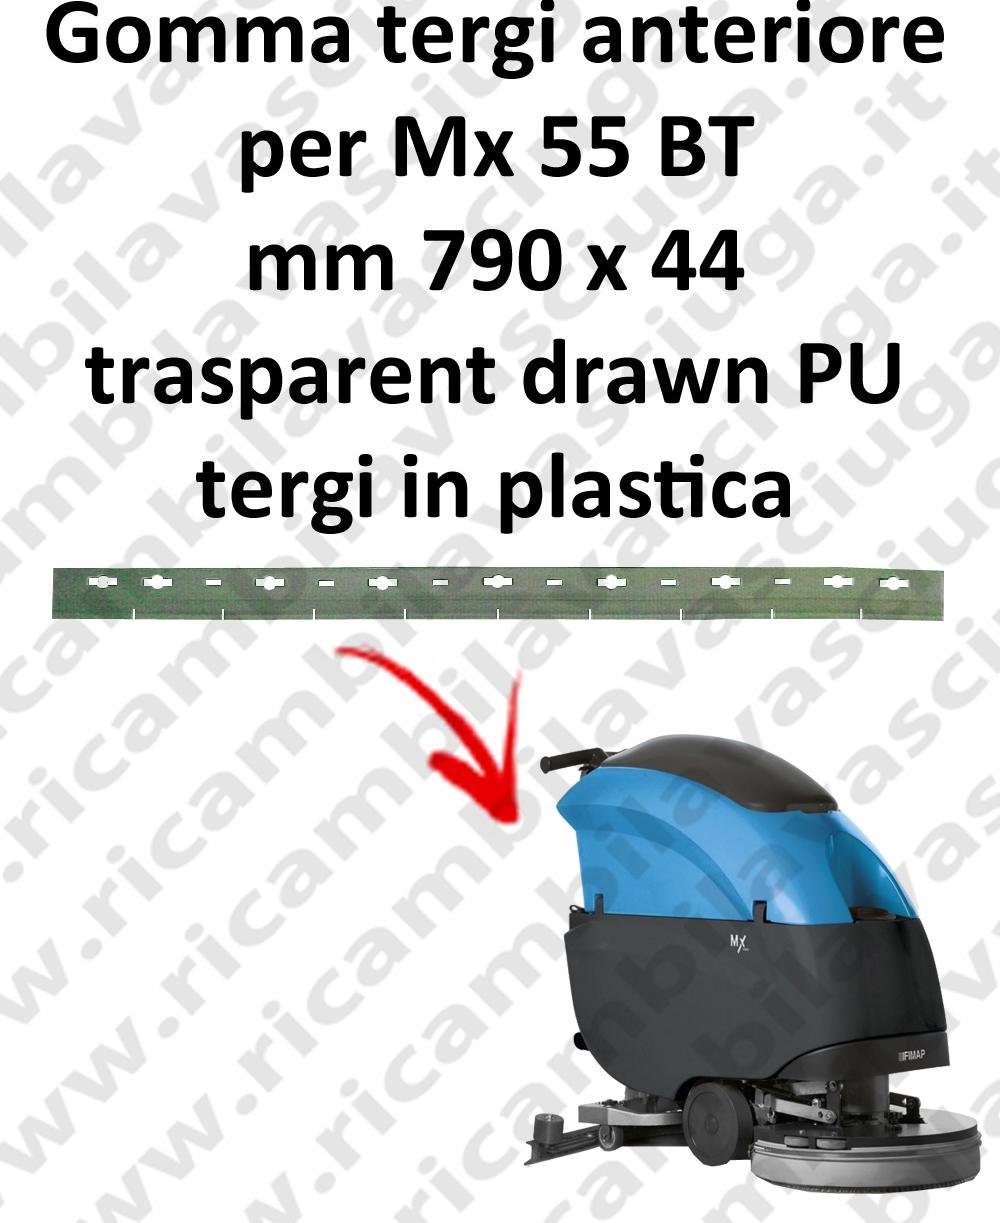 Gomma tergipavimento anteriore per lavapavimenti FIMAP - Mx 55 BT